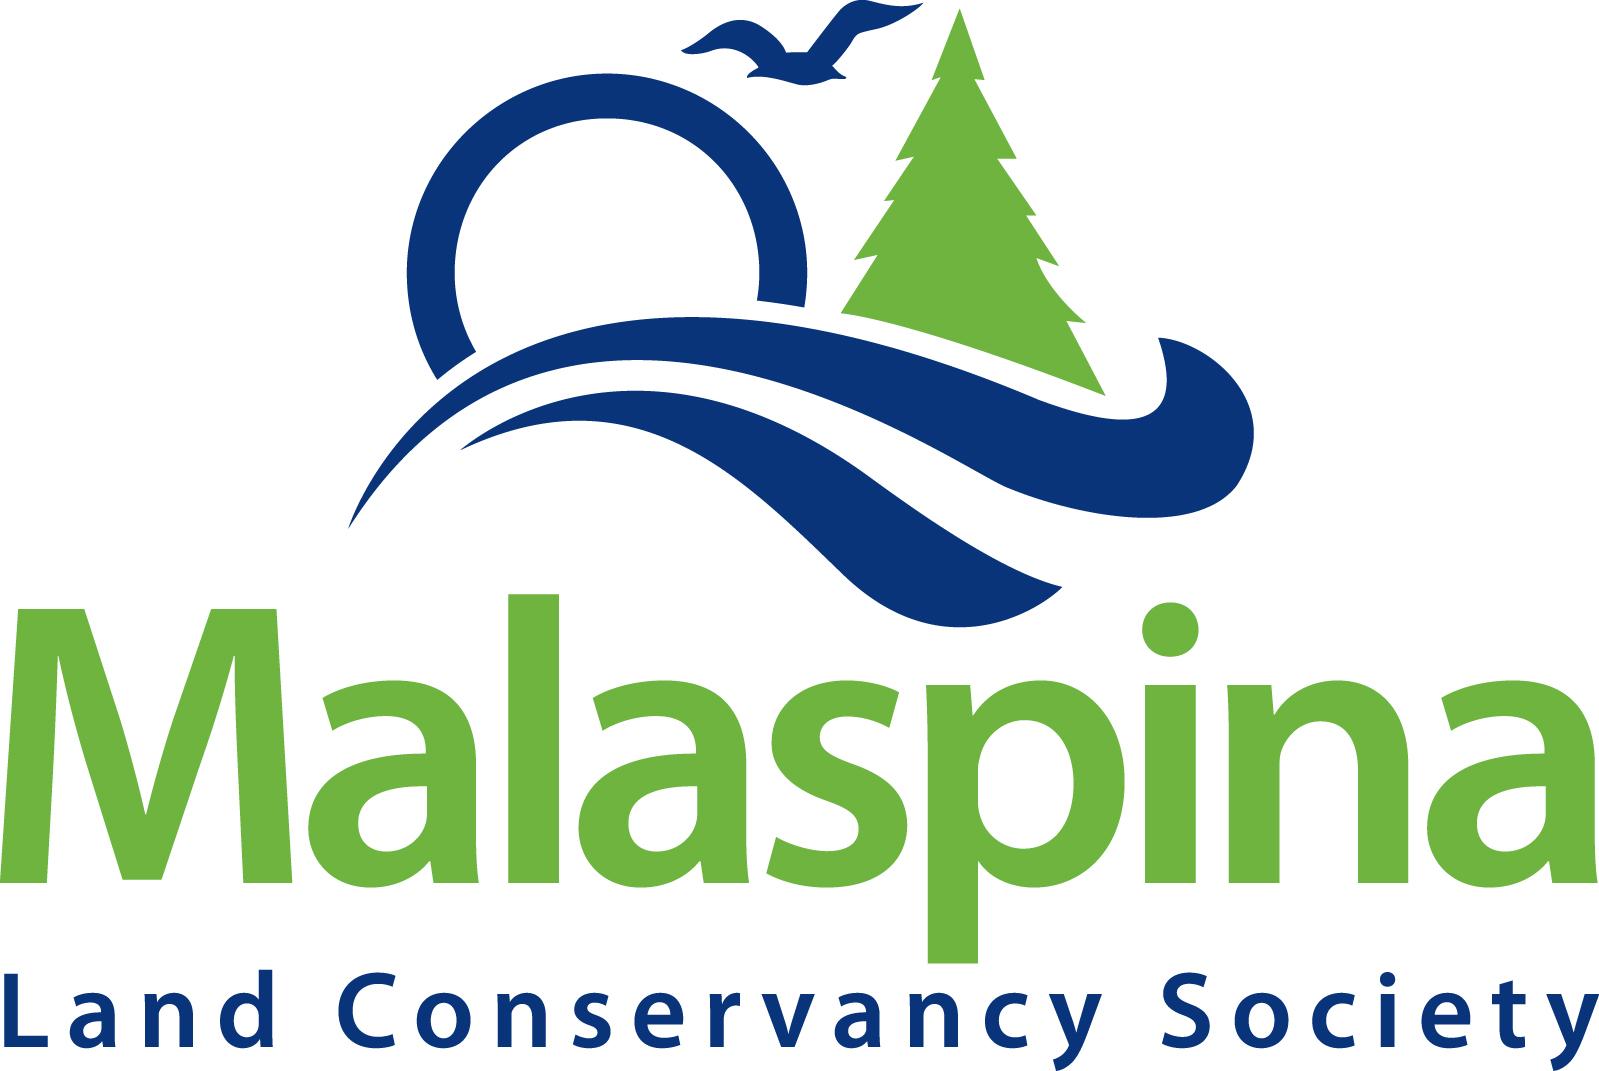 Official Logo of Malaspina Land Conservancy Society